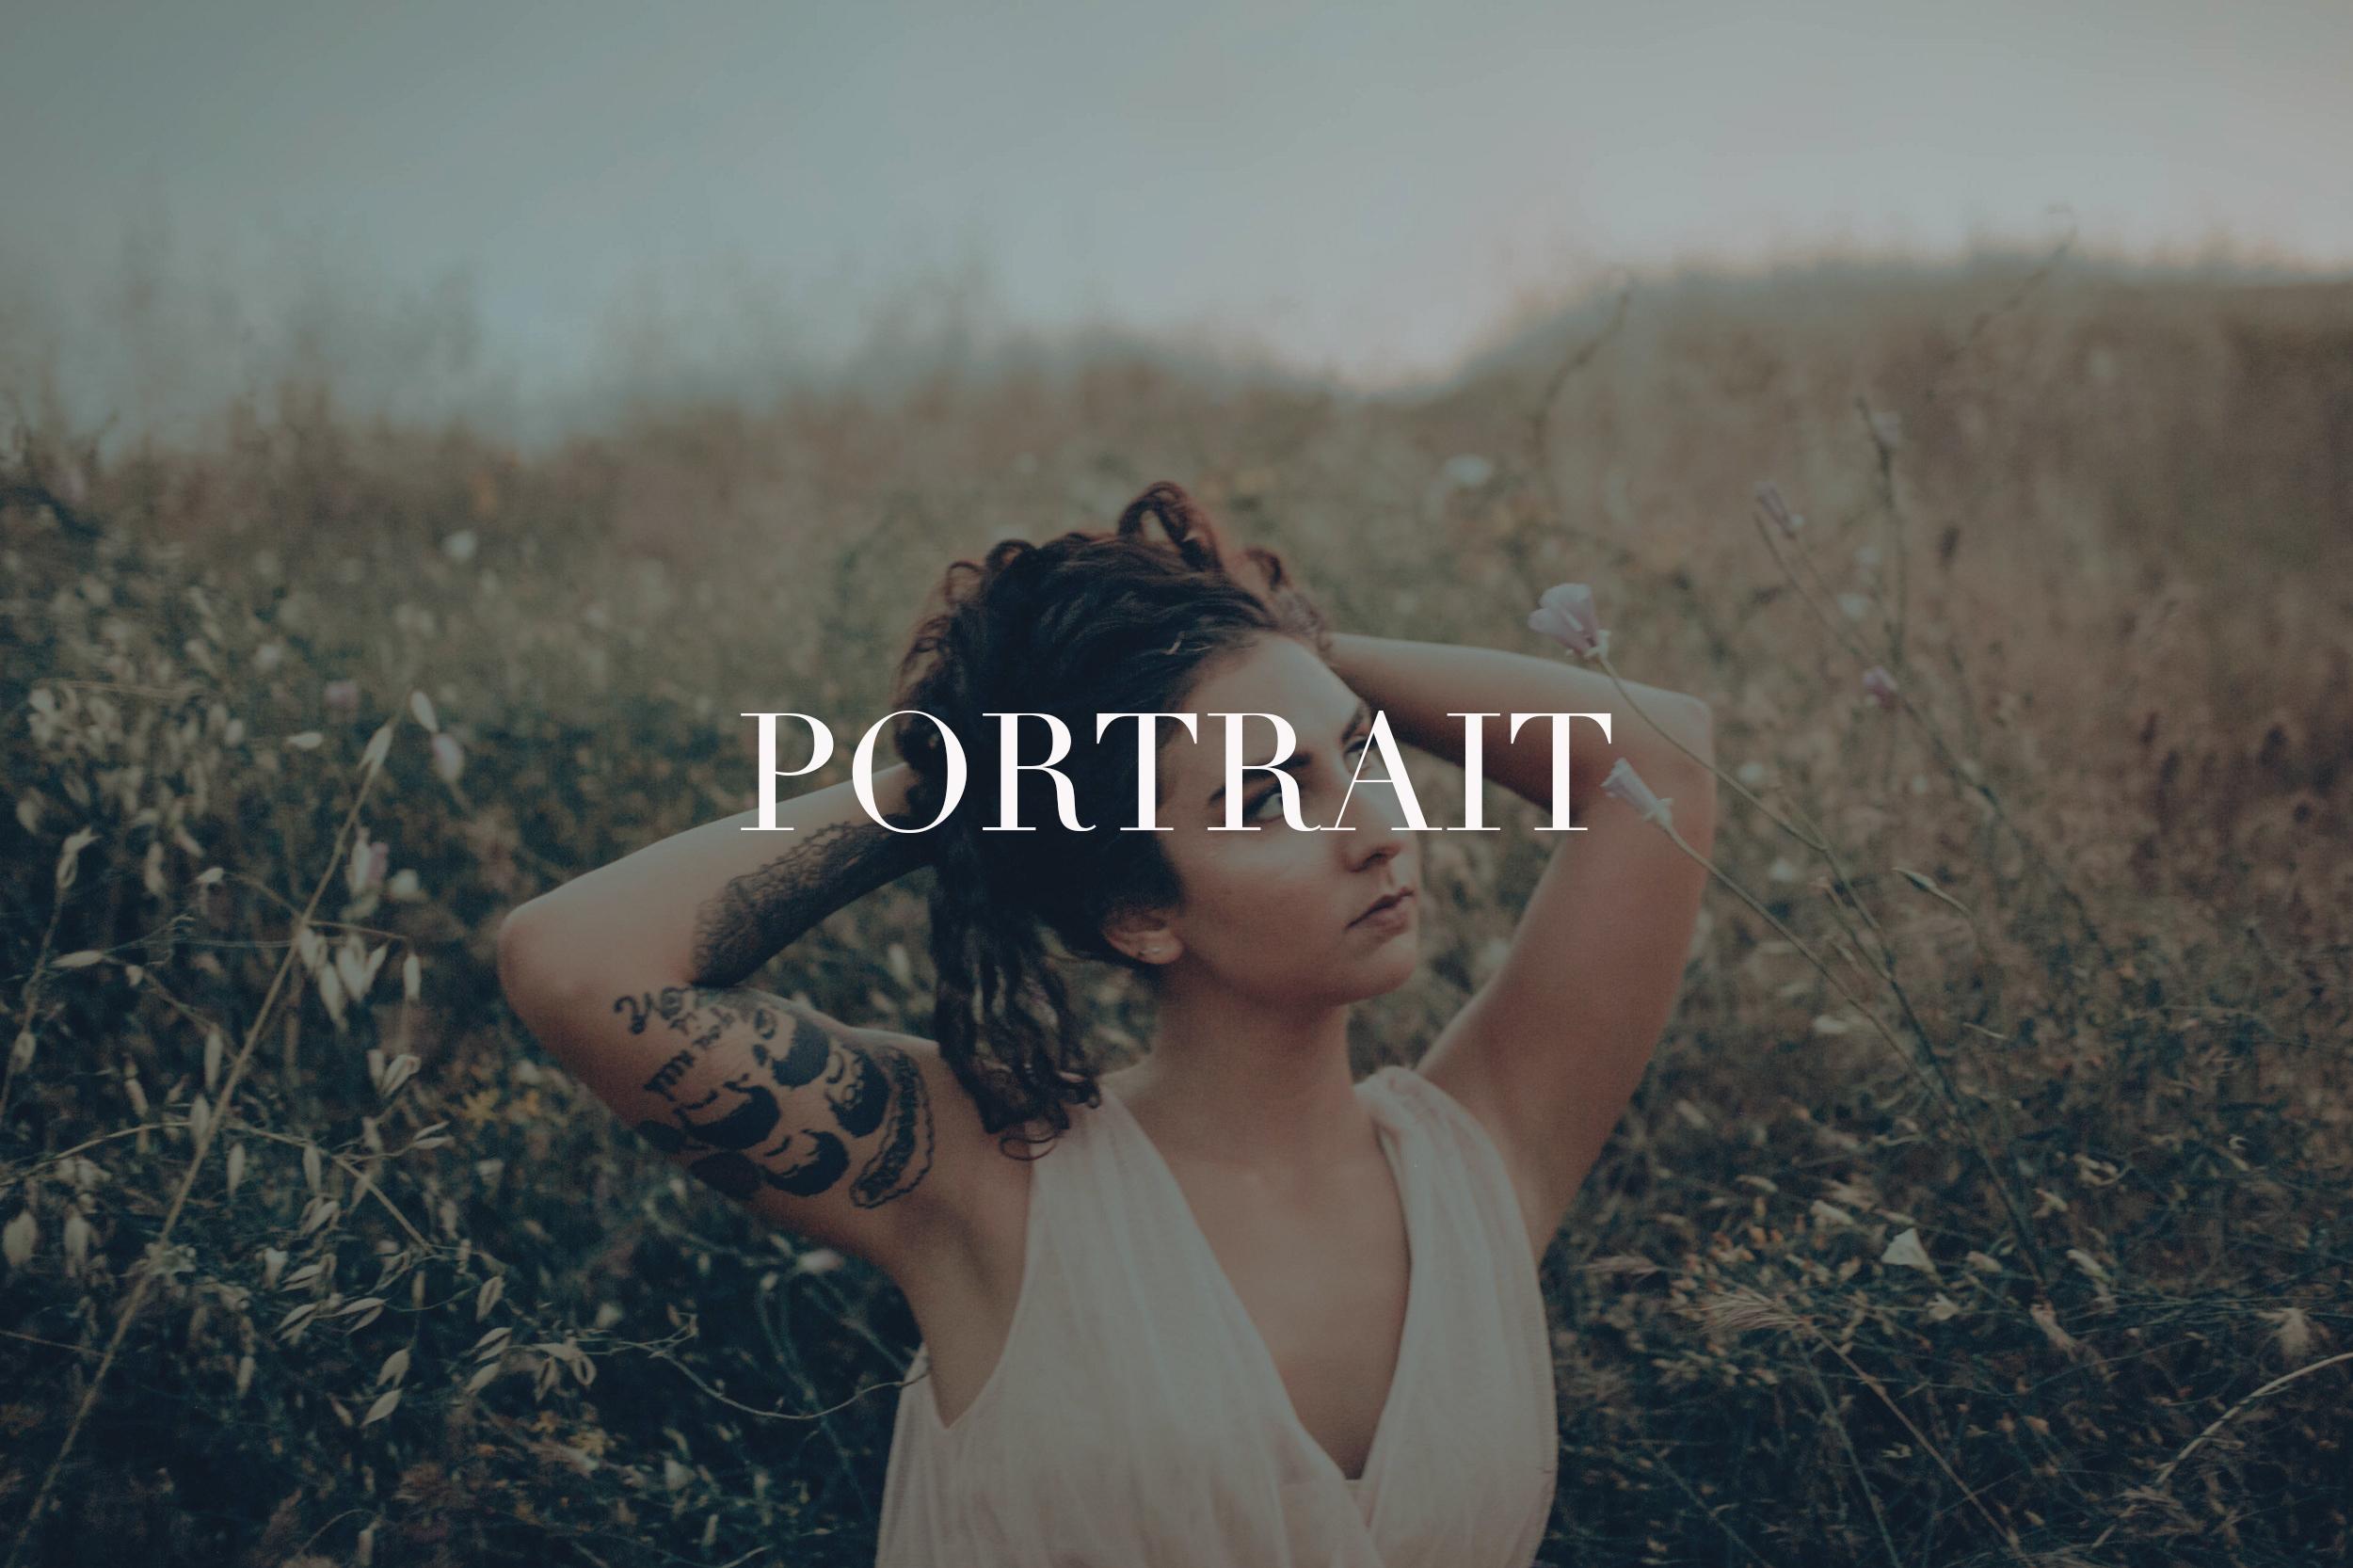 portrait pic.jpg